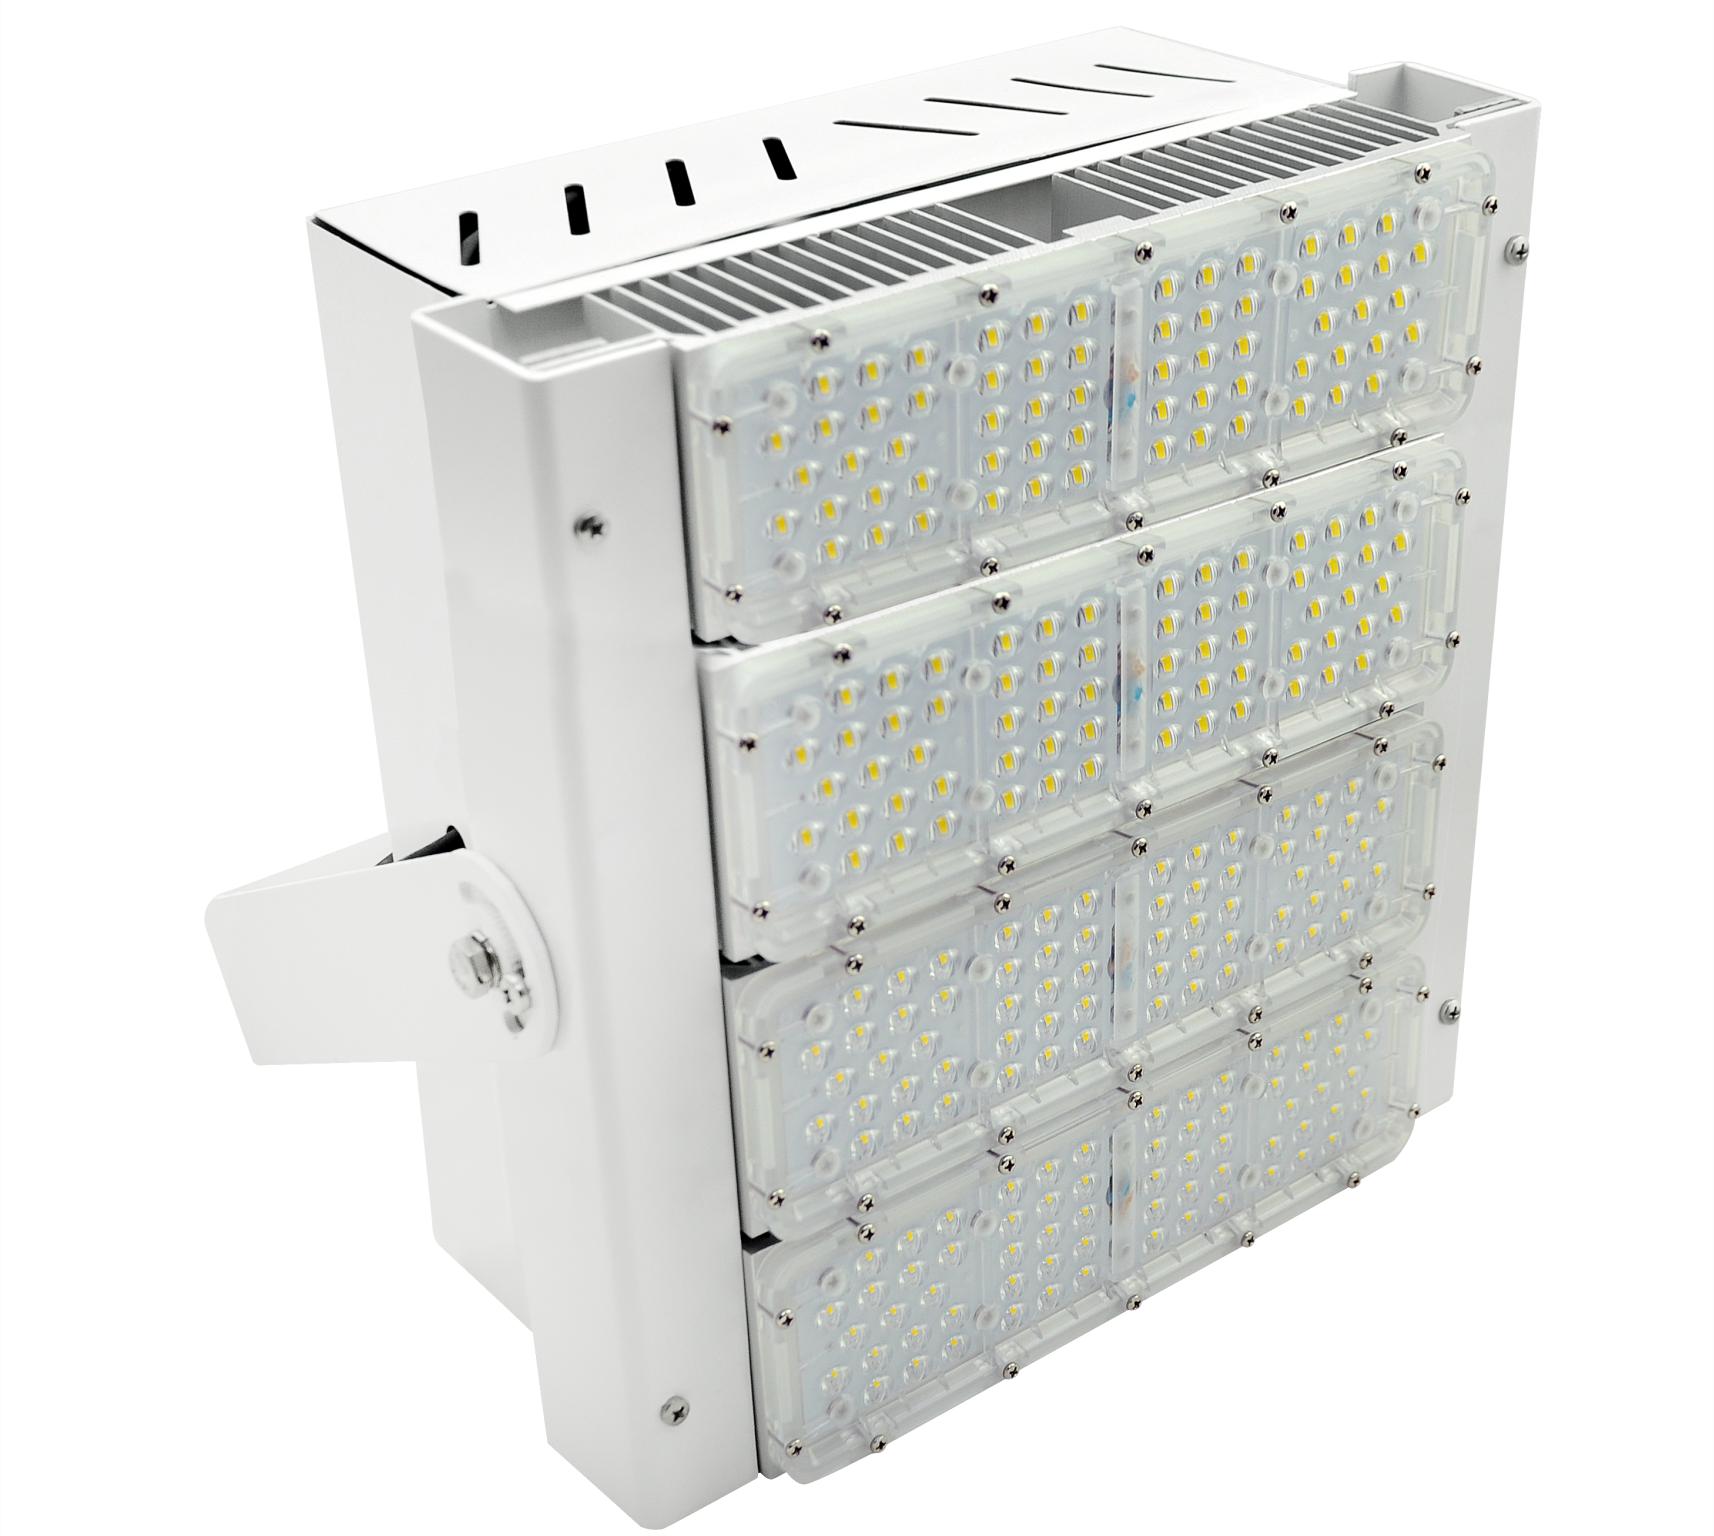 REFLETOR LED 200W MODULO DC COM DPS 4X50 90° 5000K 150LM/W ALUMINIO AUTOVOLT BRANCA